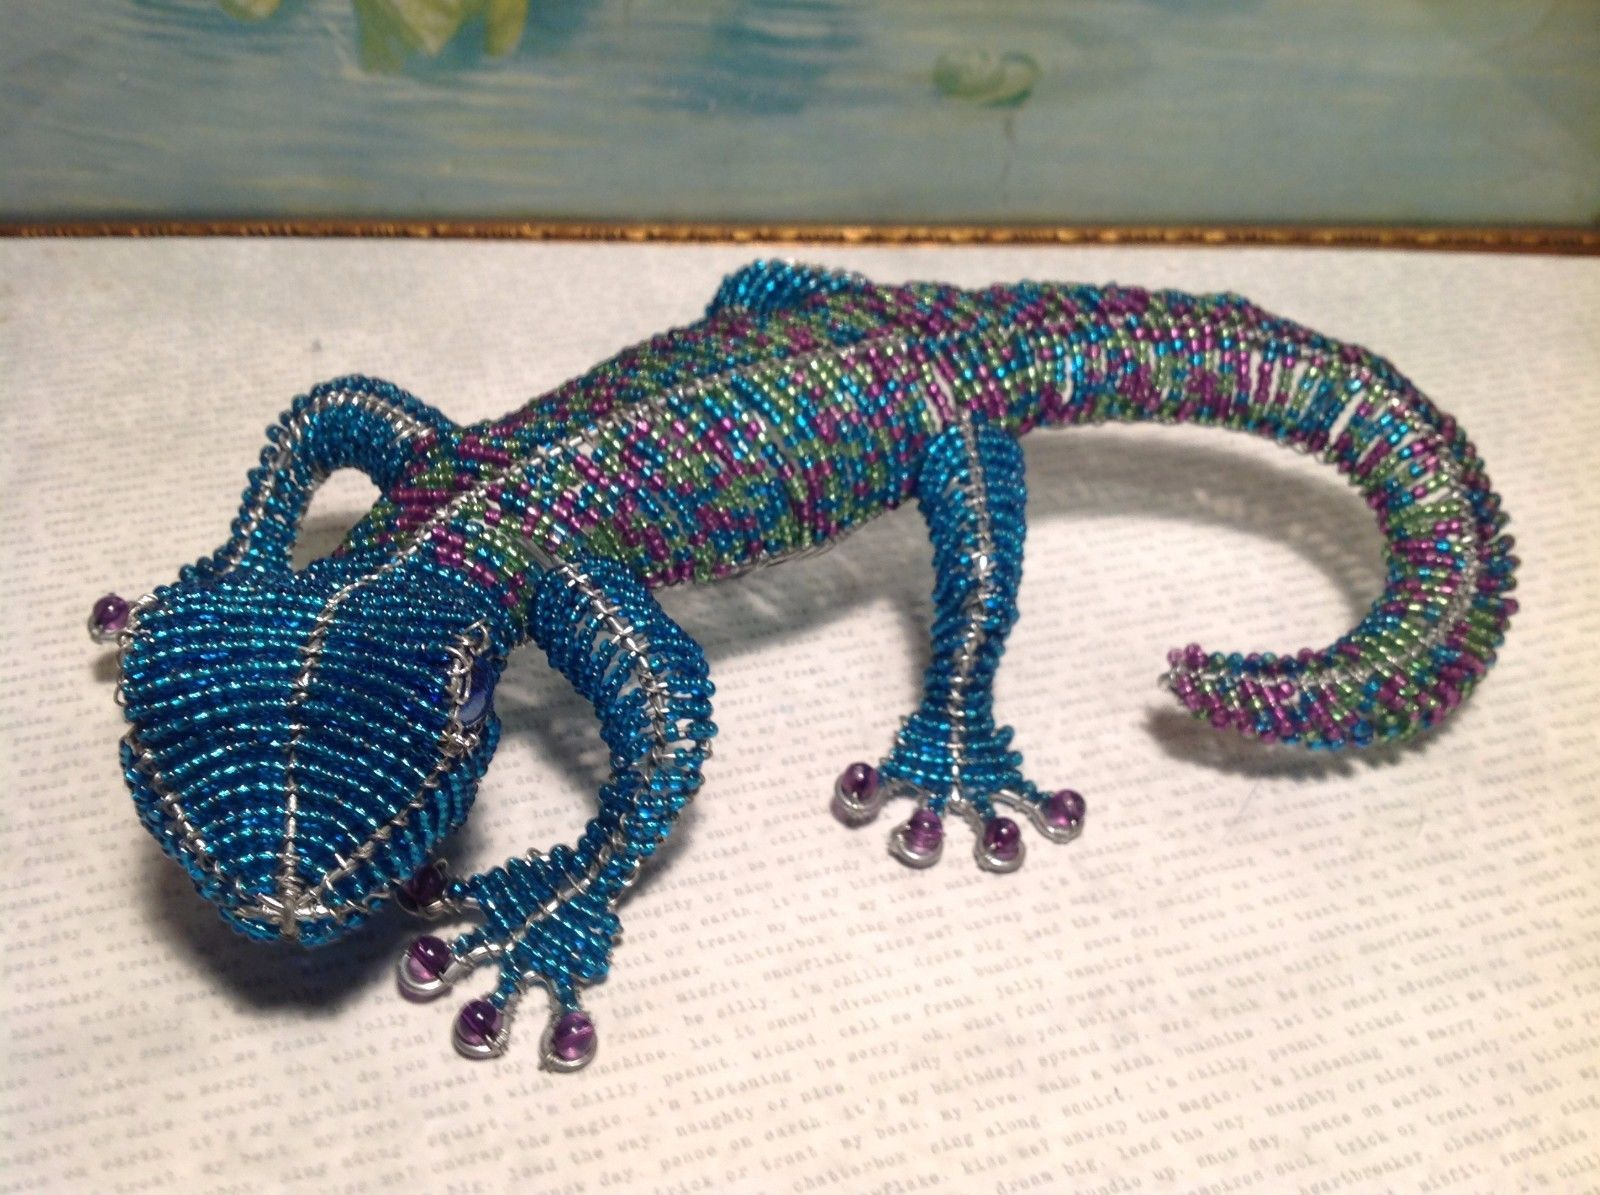 NEW Large Decorative Blue Beaded Gecko Figurine by Beadworx